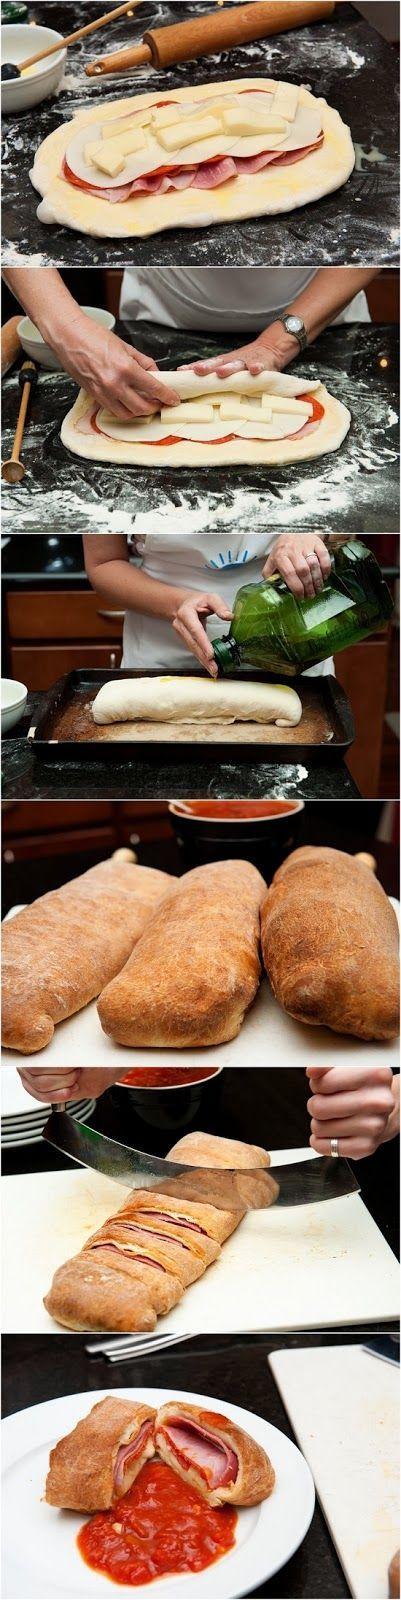 How To Easy Stromboli~Ingredients Pizza Dough Genoa Salami Ham Pepperoni Provolone Mozzarella Egg Yolk Olive Oil